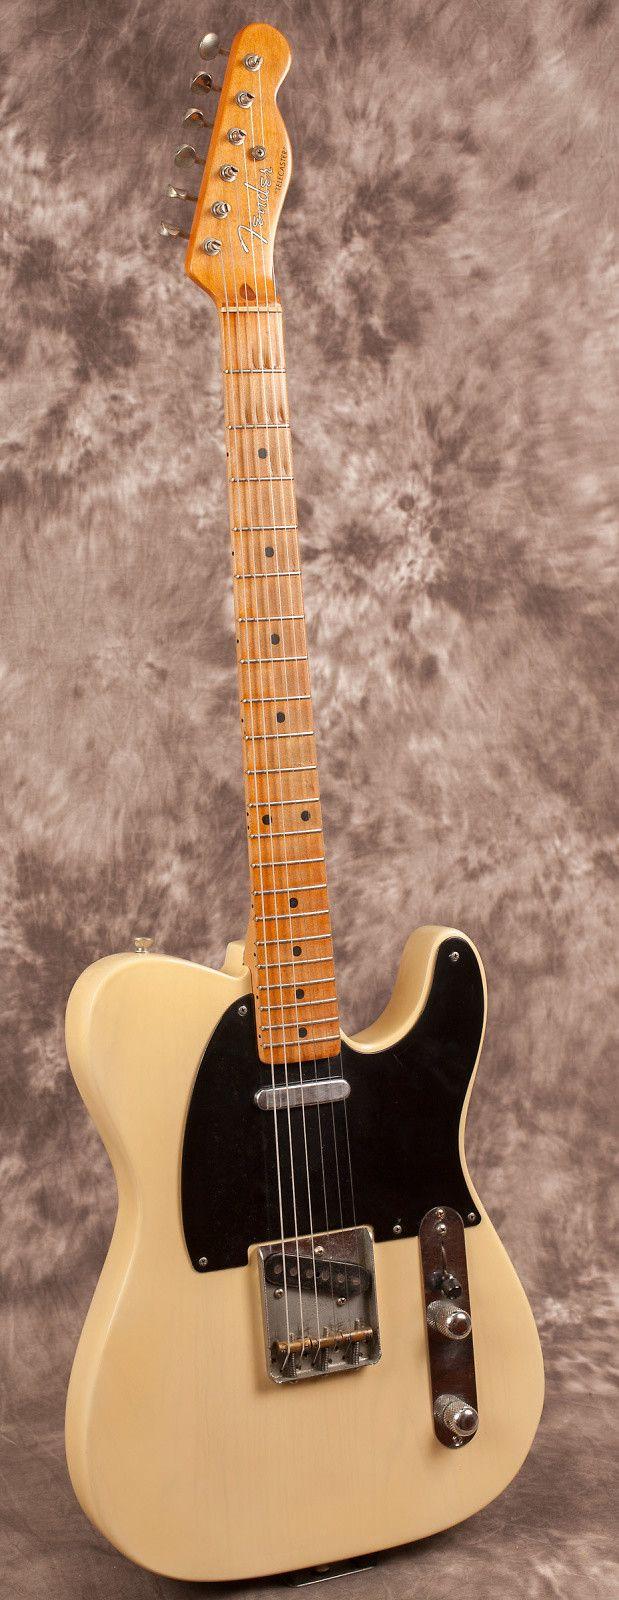 Fender Telecaster Blonde 1953 Vintage Guitar Pinterest James Burton Wiring Diagram Butterscotch Reverb